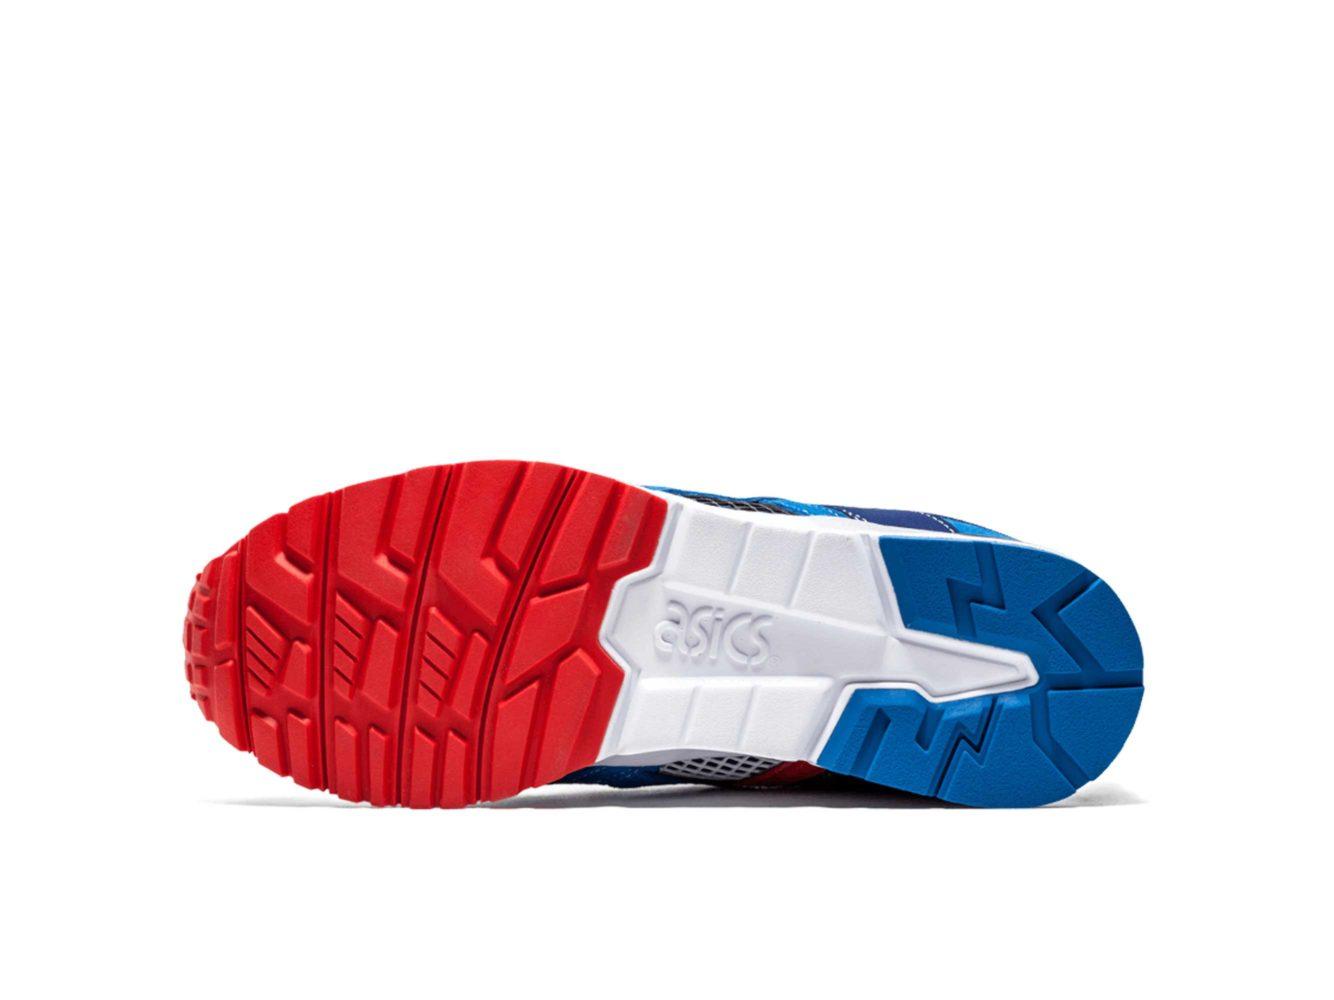 asics gel lyte 5 navy blue H60SJ_5042 купить